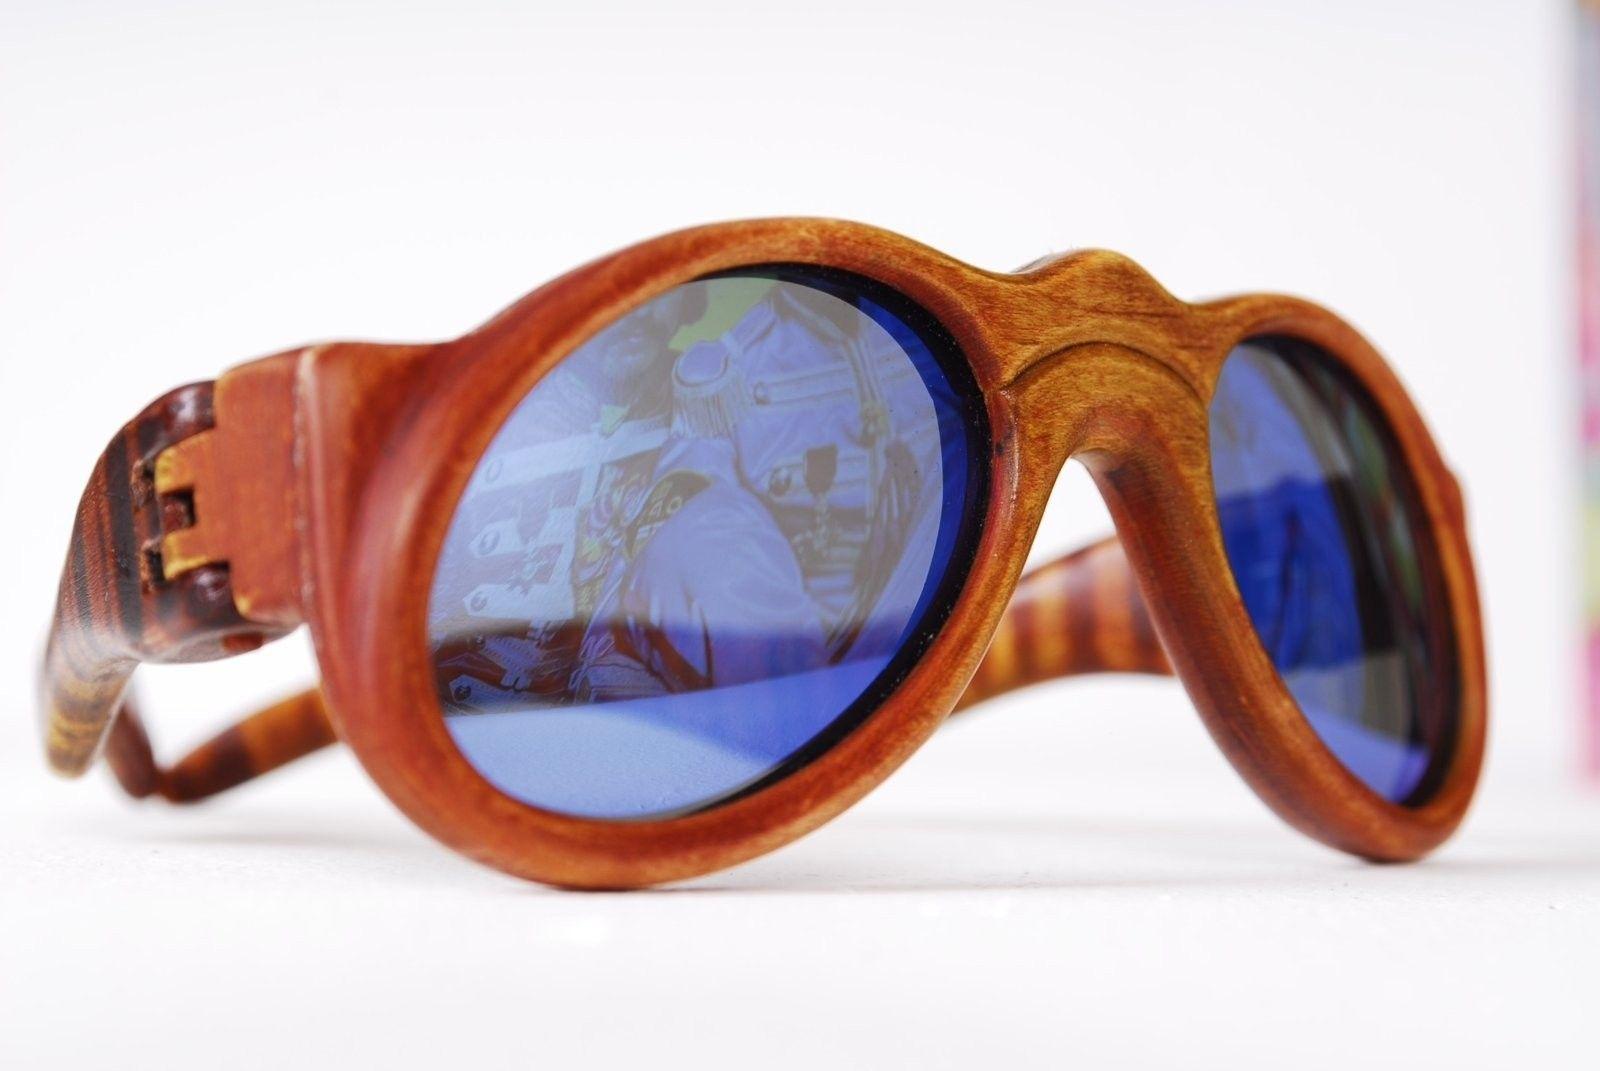 Spectacular Handmade Wooden Sunglasses - 2016-05 Jaromir Oval 13.JPG